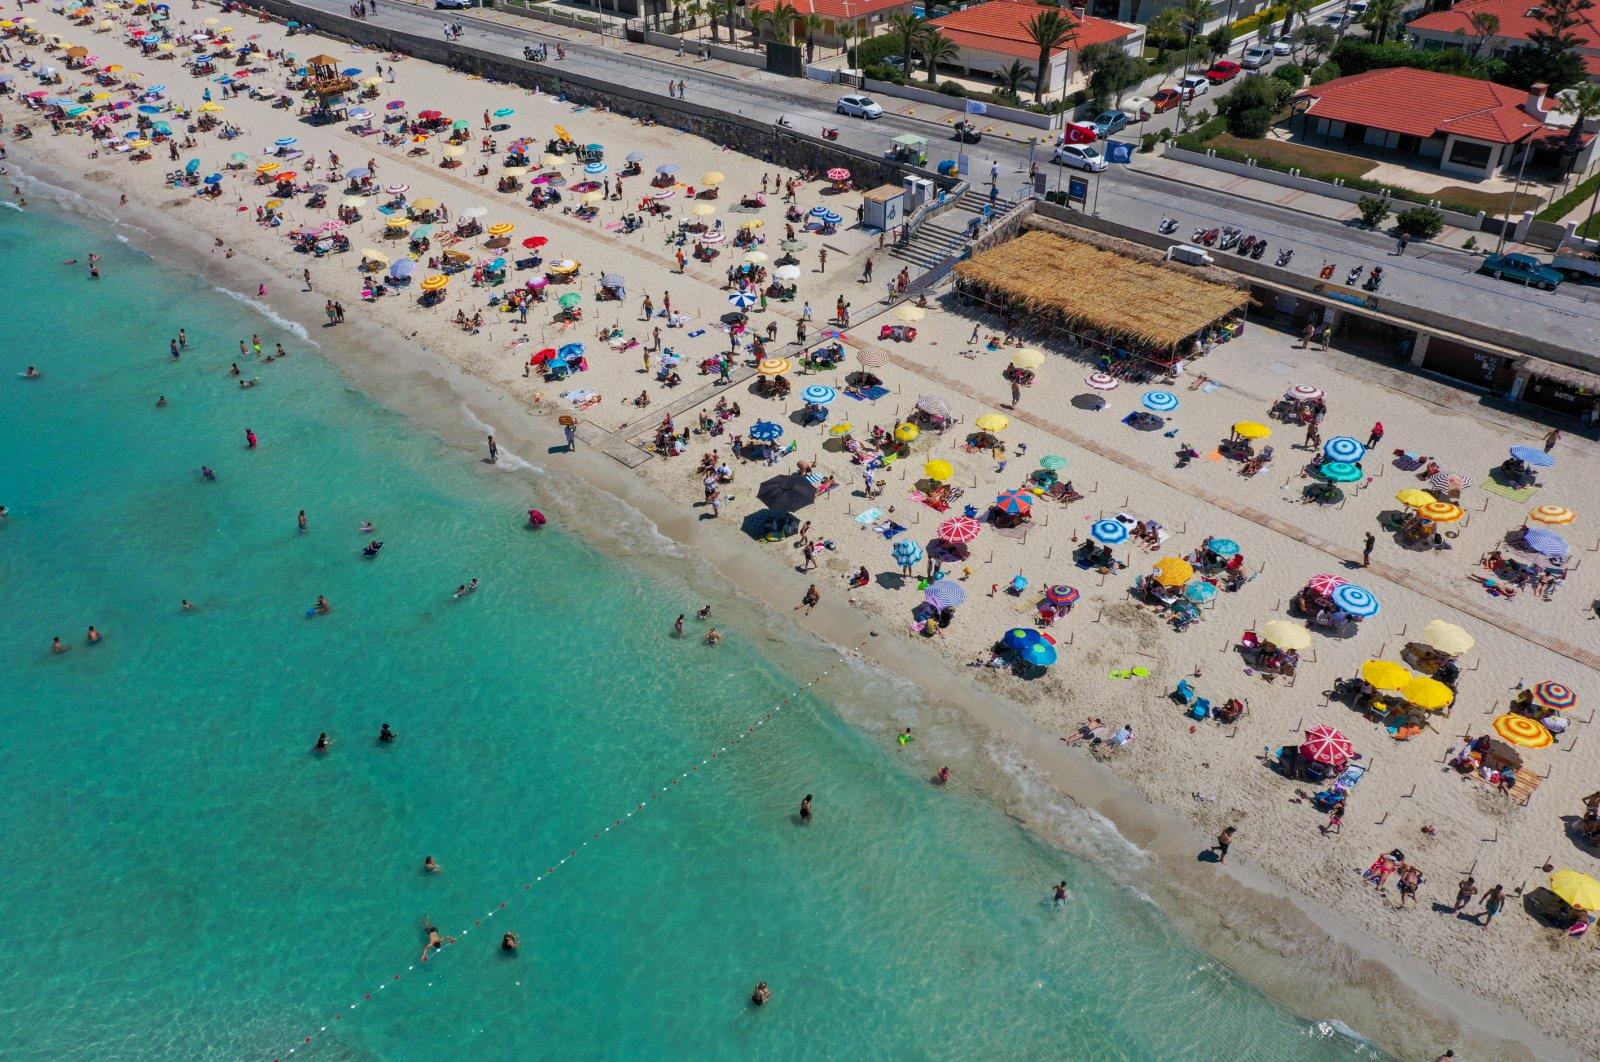 Tourists enjoy the sun at Ilıca Beach in Çeşme, a resort town west of Izmir, in Turkey's Aegean region, July 19, 2020. (AA Photo)